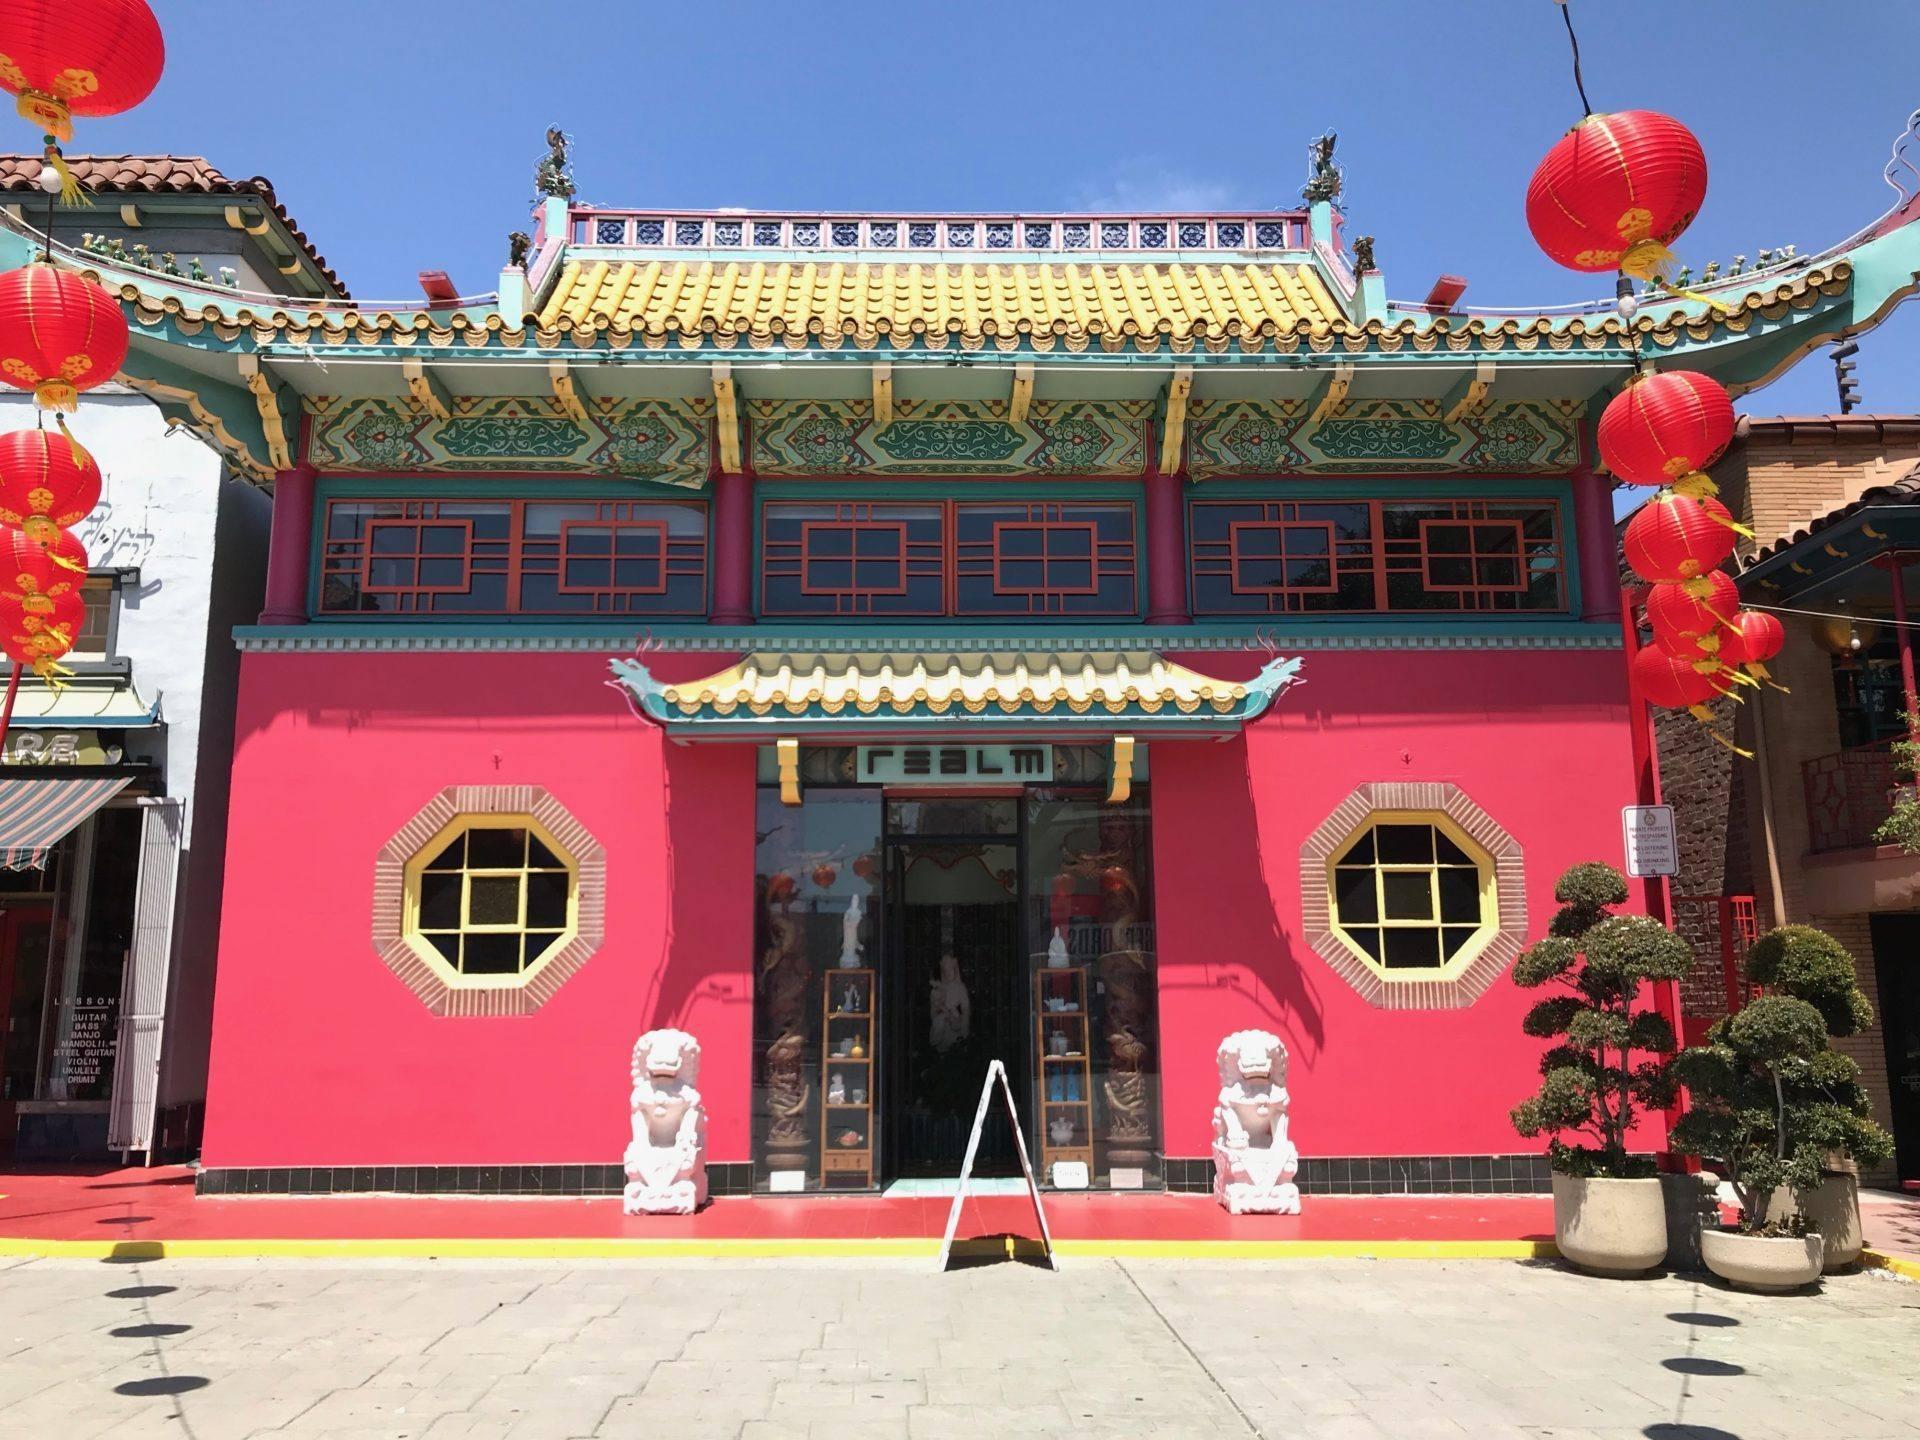 Realm in Chinatown's Central Plaza | Photo: Art Salon Chinatown